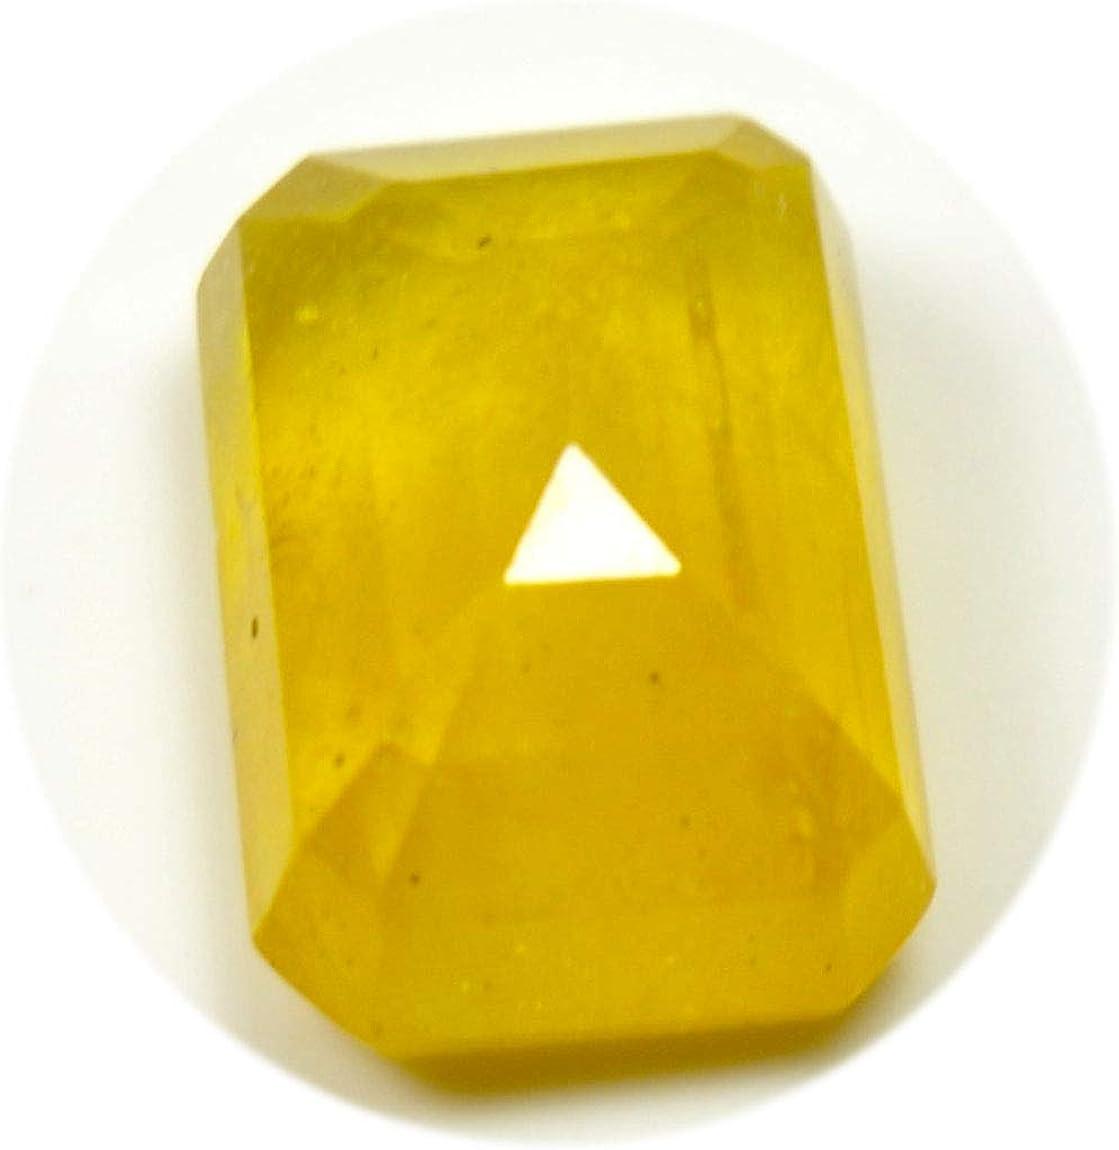 Jewelryonclick Pierres pr/écieuses en Vrac Saphir Jaune v/éritable 6 carats de Septembre octogone coup/és en Gros